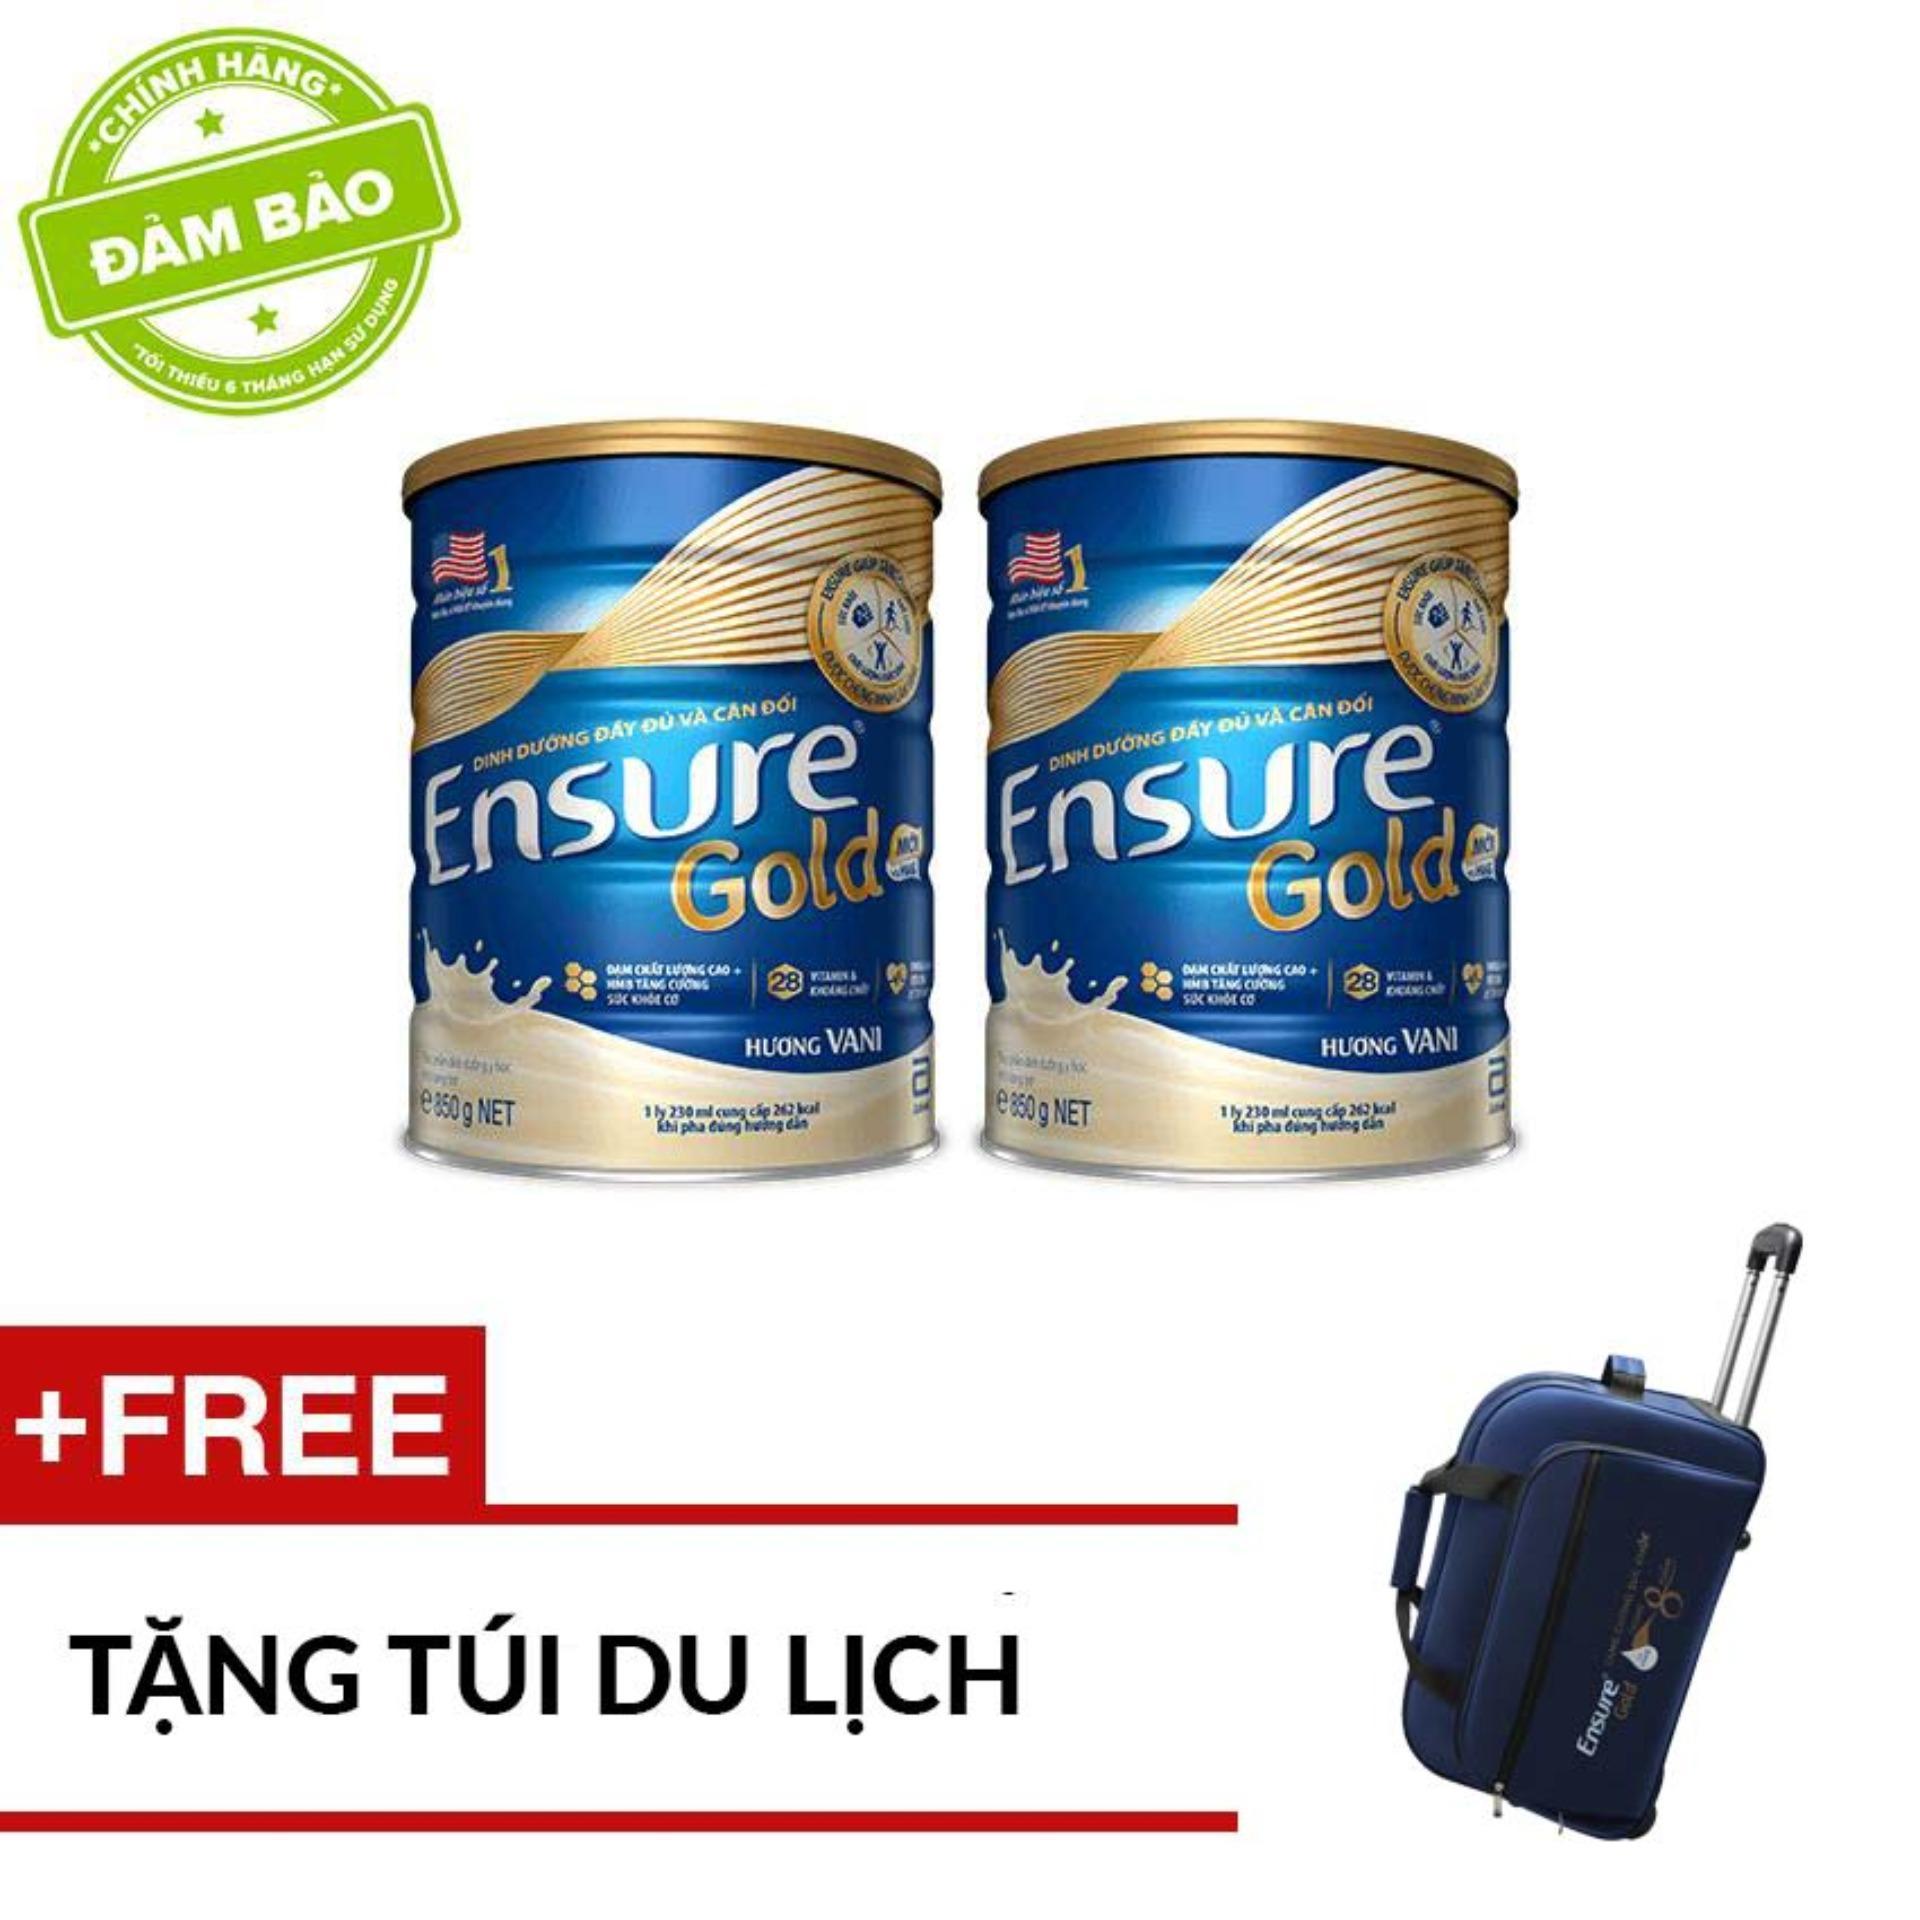 Bộ 2 Lon Ensure 850g - Tặng Túi Du Lịch By Lazada Retail Ensure.